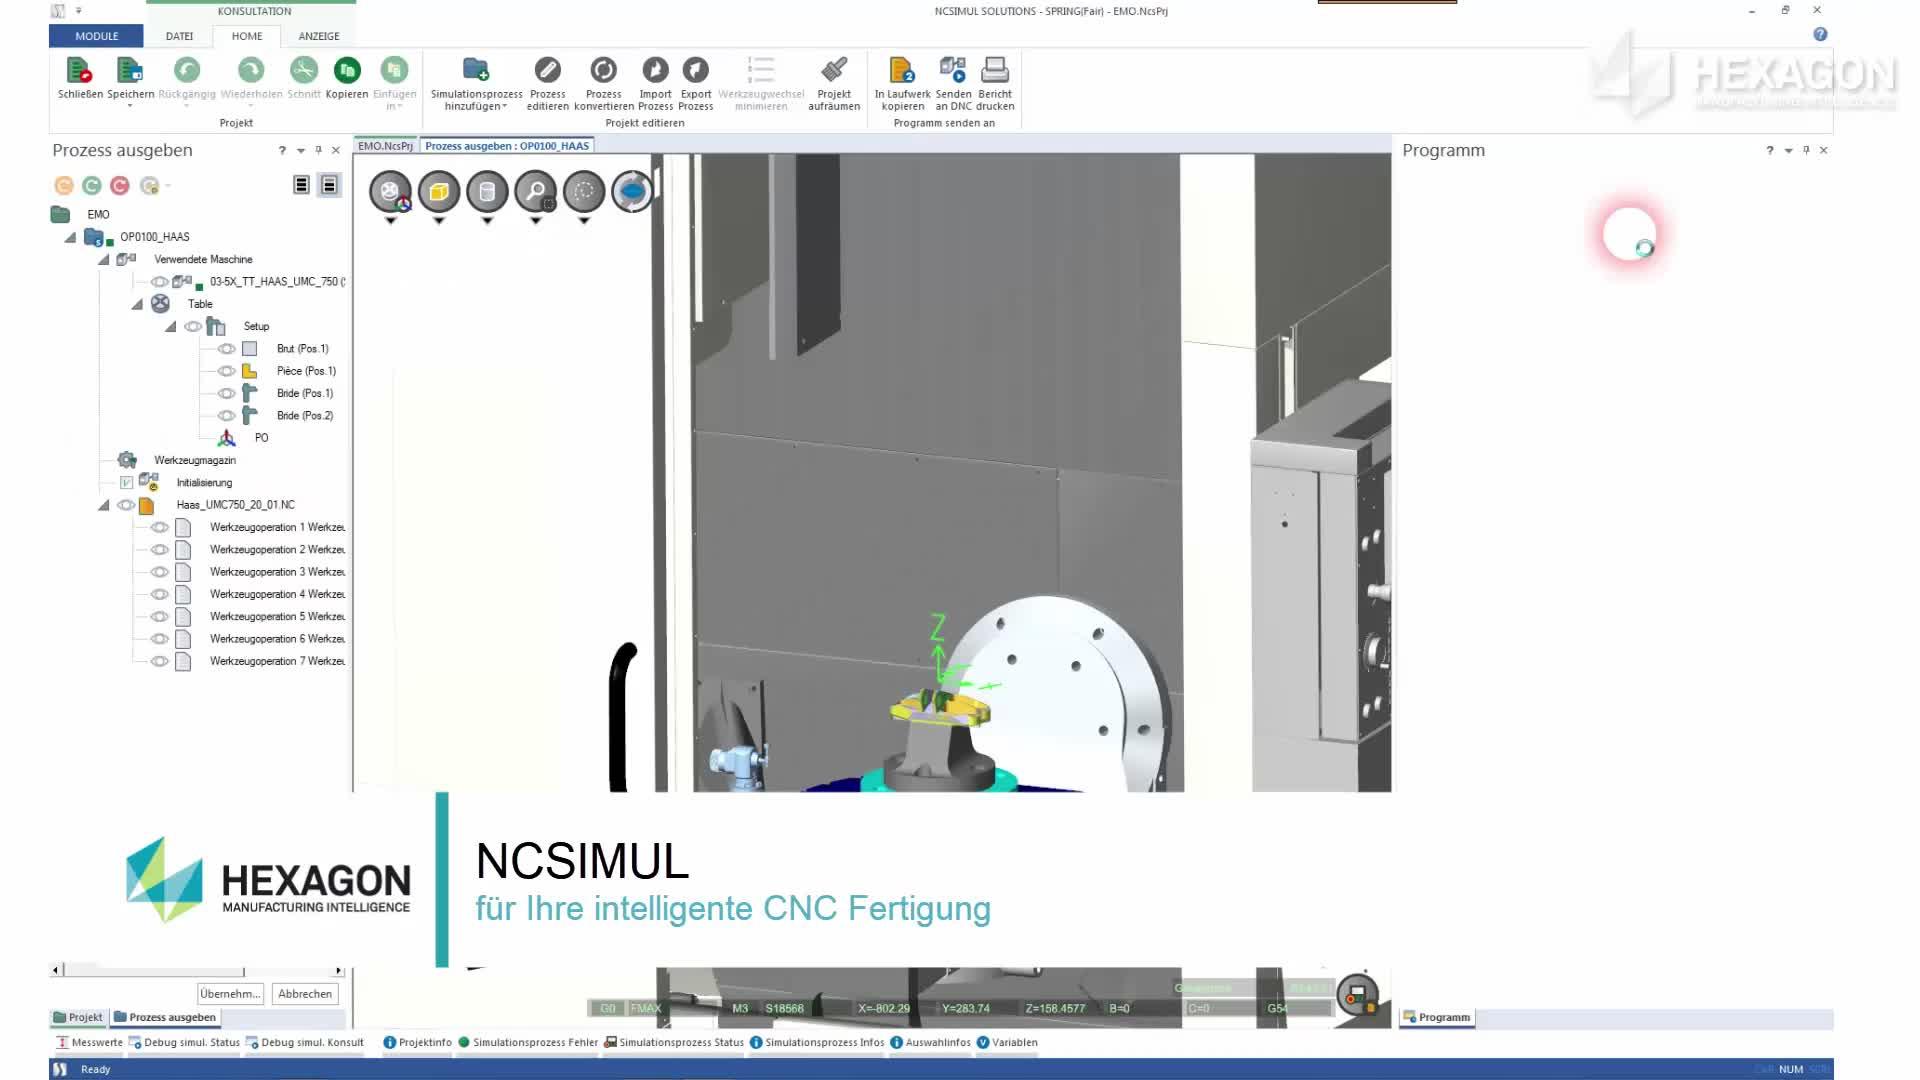 Intelligente CNC Fertigung mit NCSIMUL: Kollisionsfreie NC Programme. Automatisierte Prozesse. Flexible Produktion.